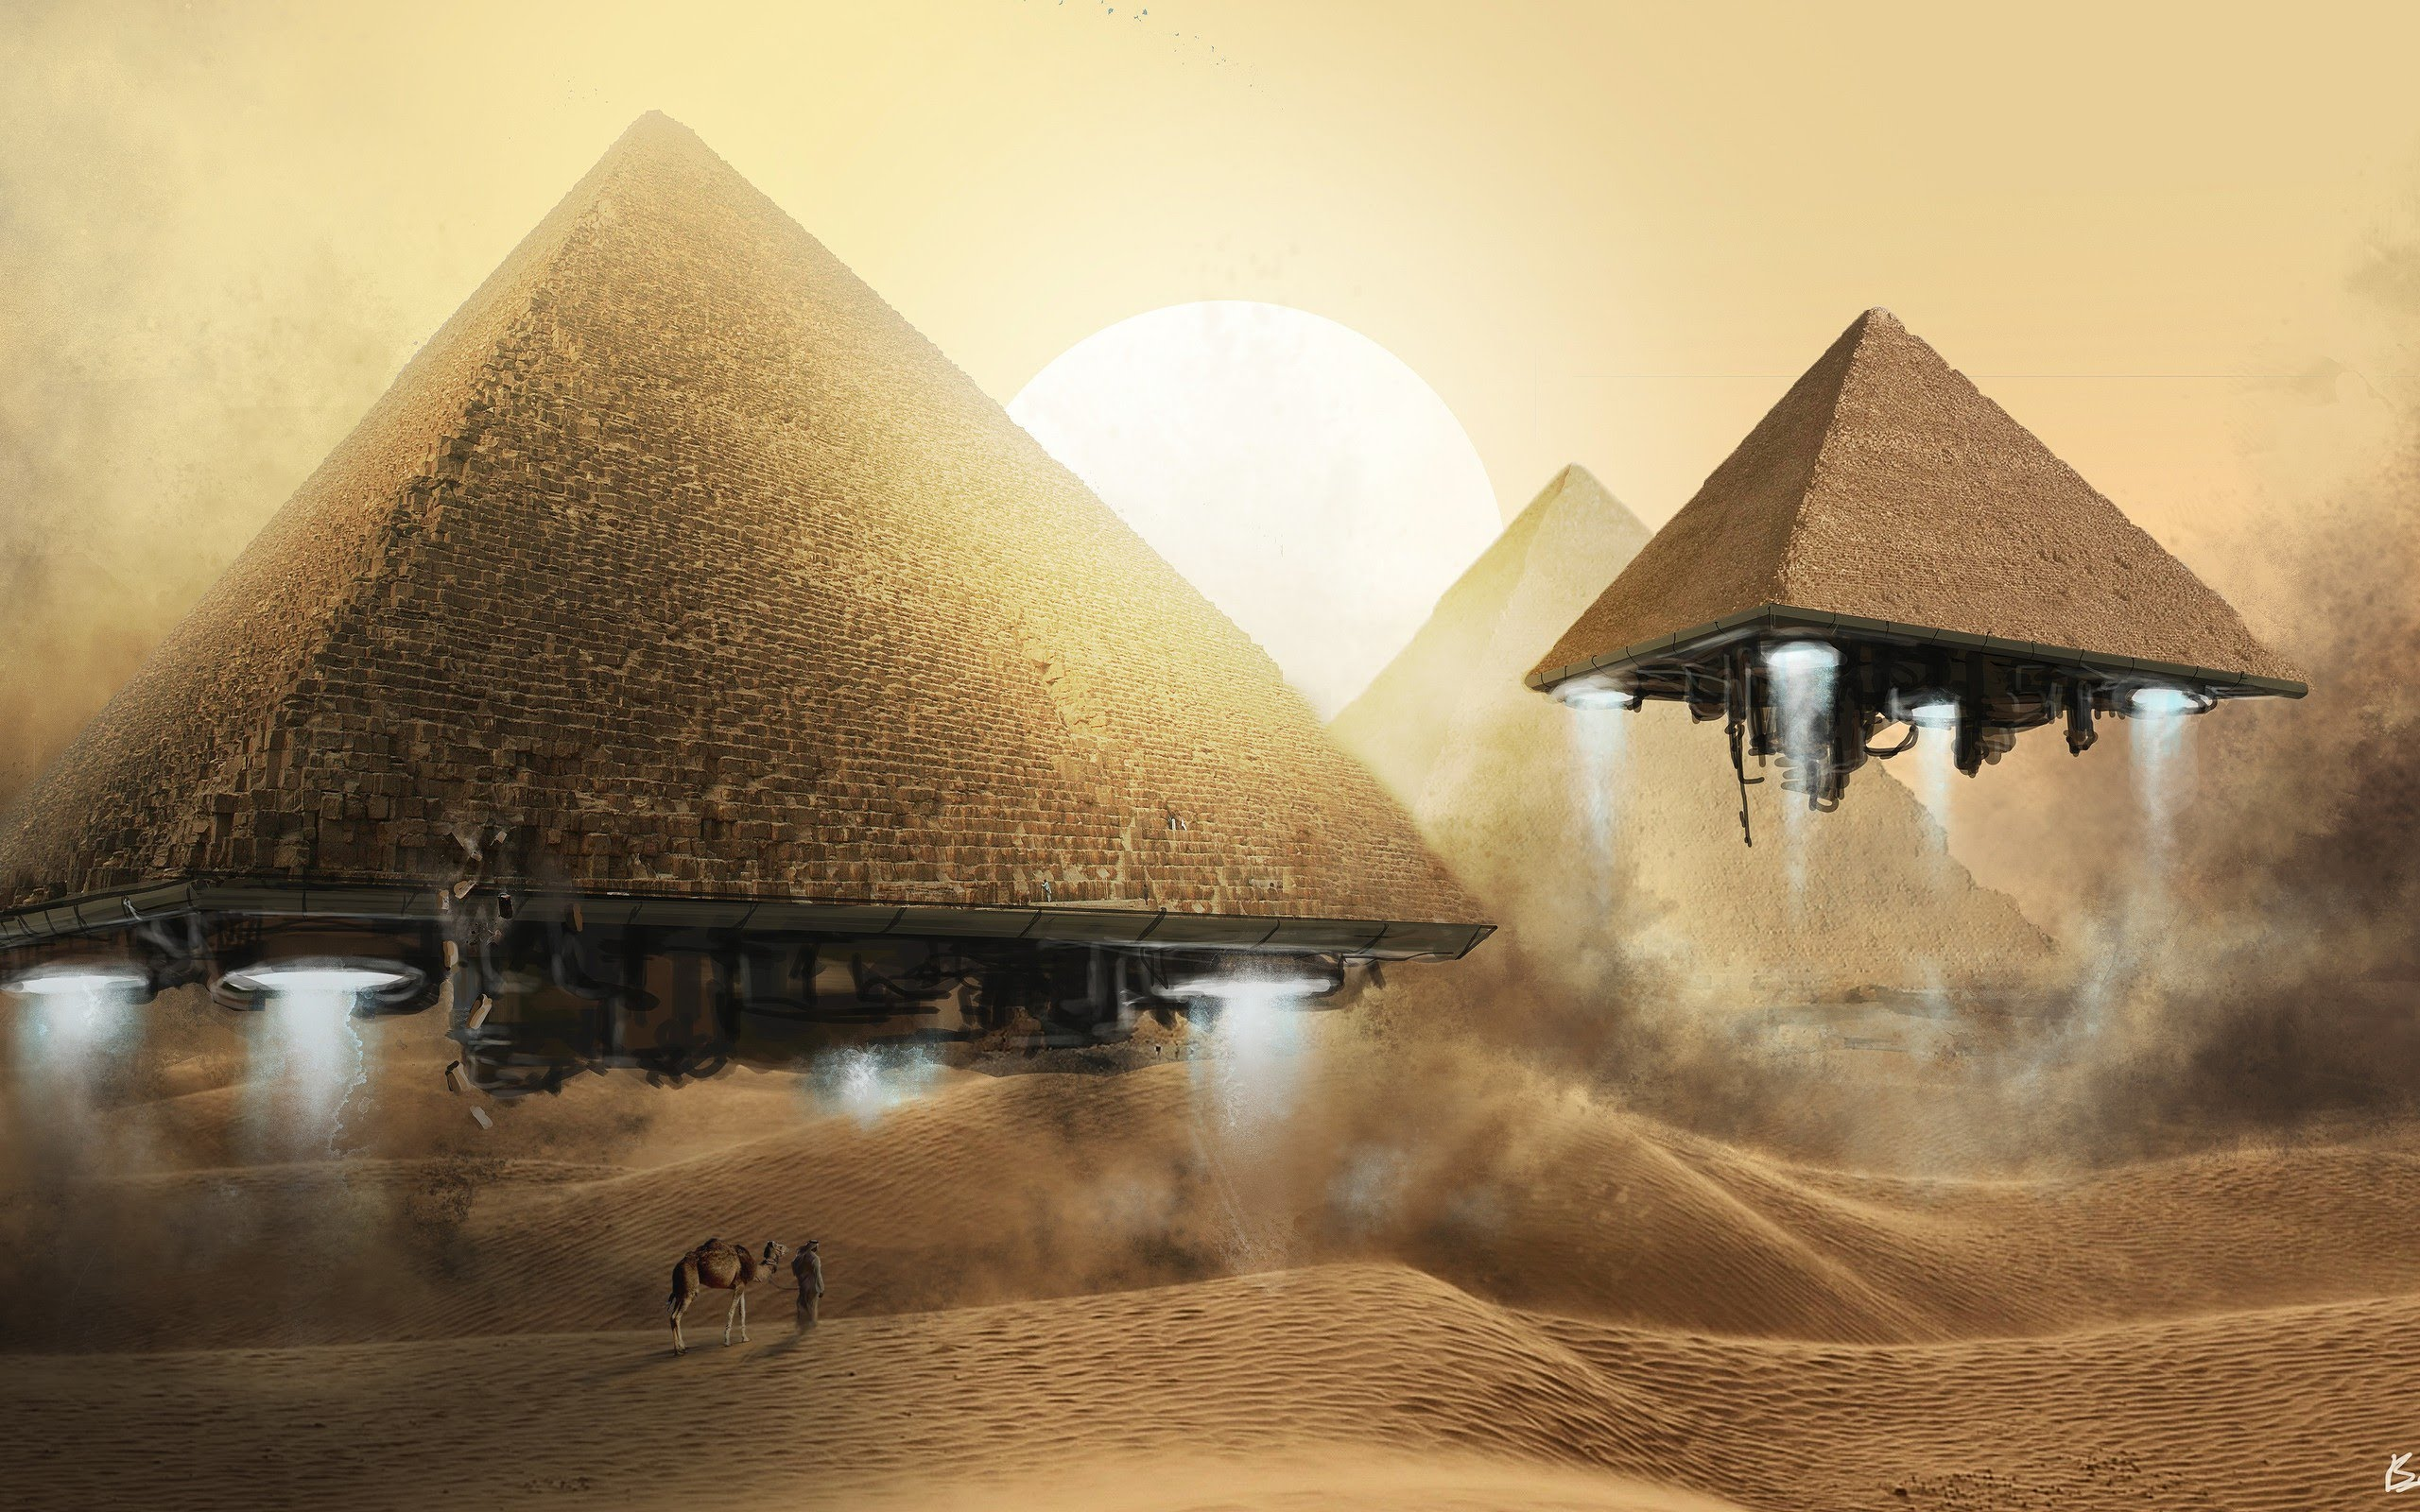 ancient-aliens-ufo-files-aliensextraterrestrialparanormal-documentary